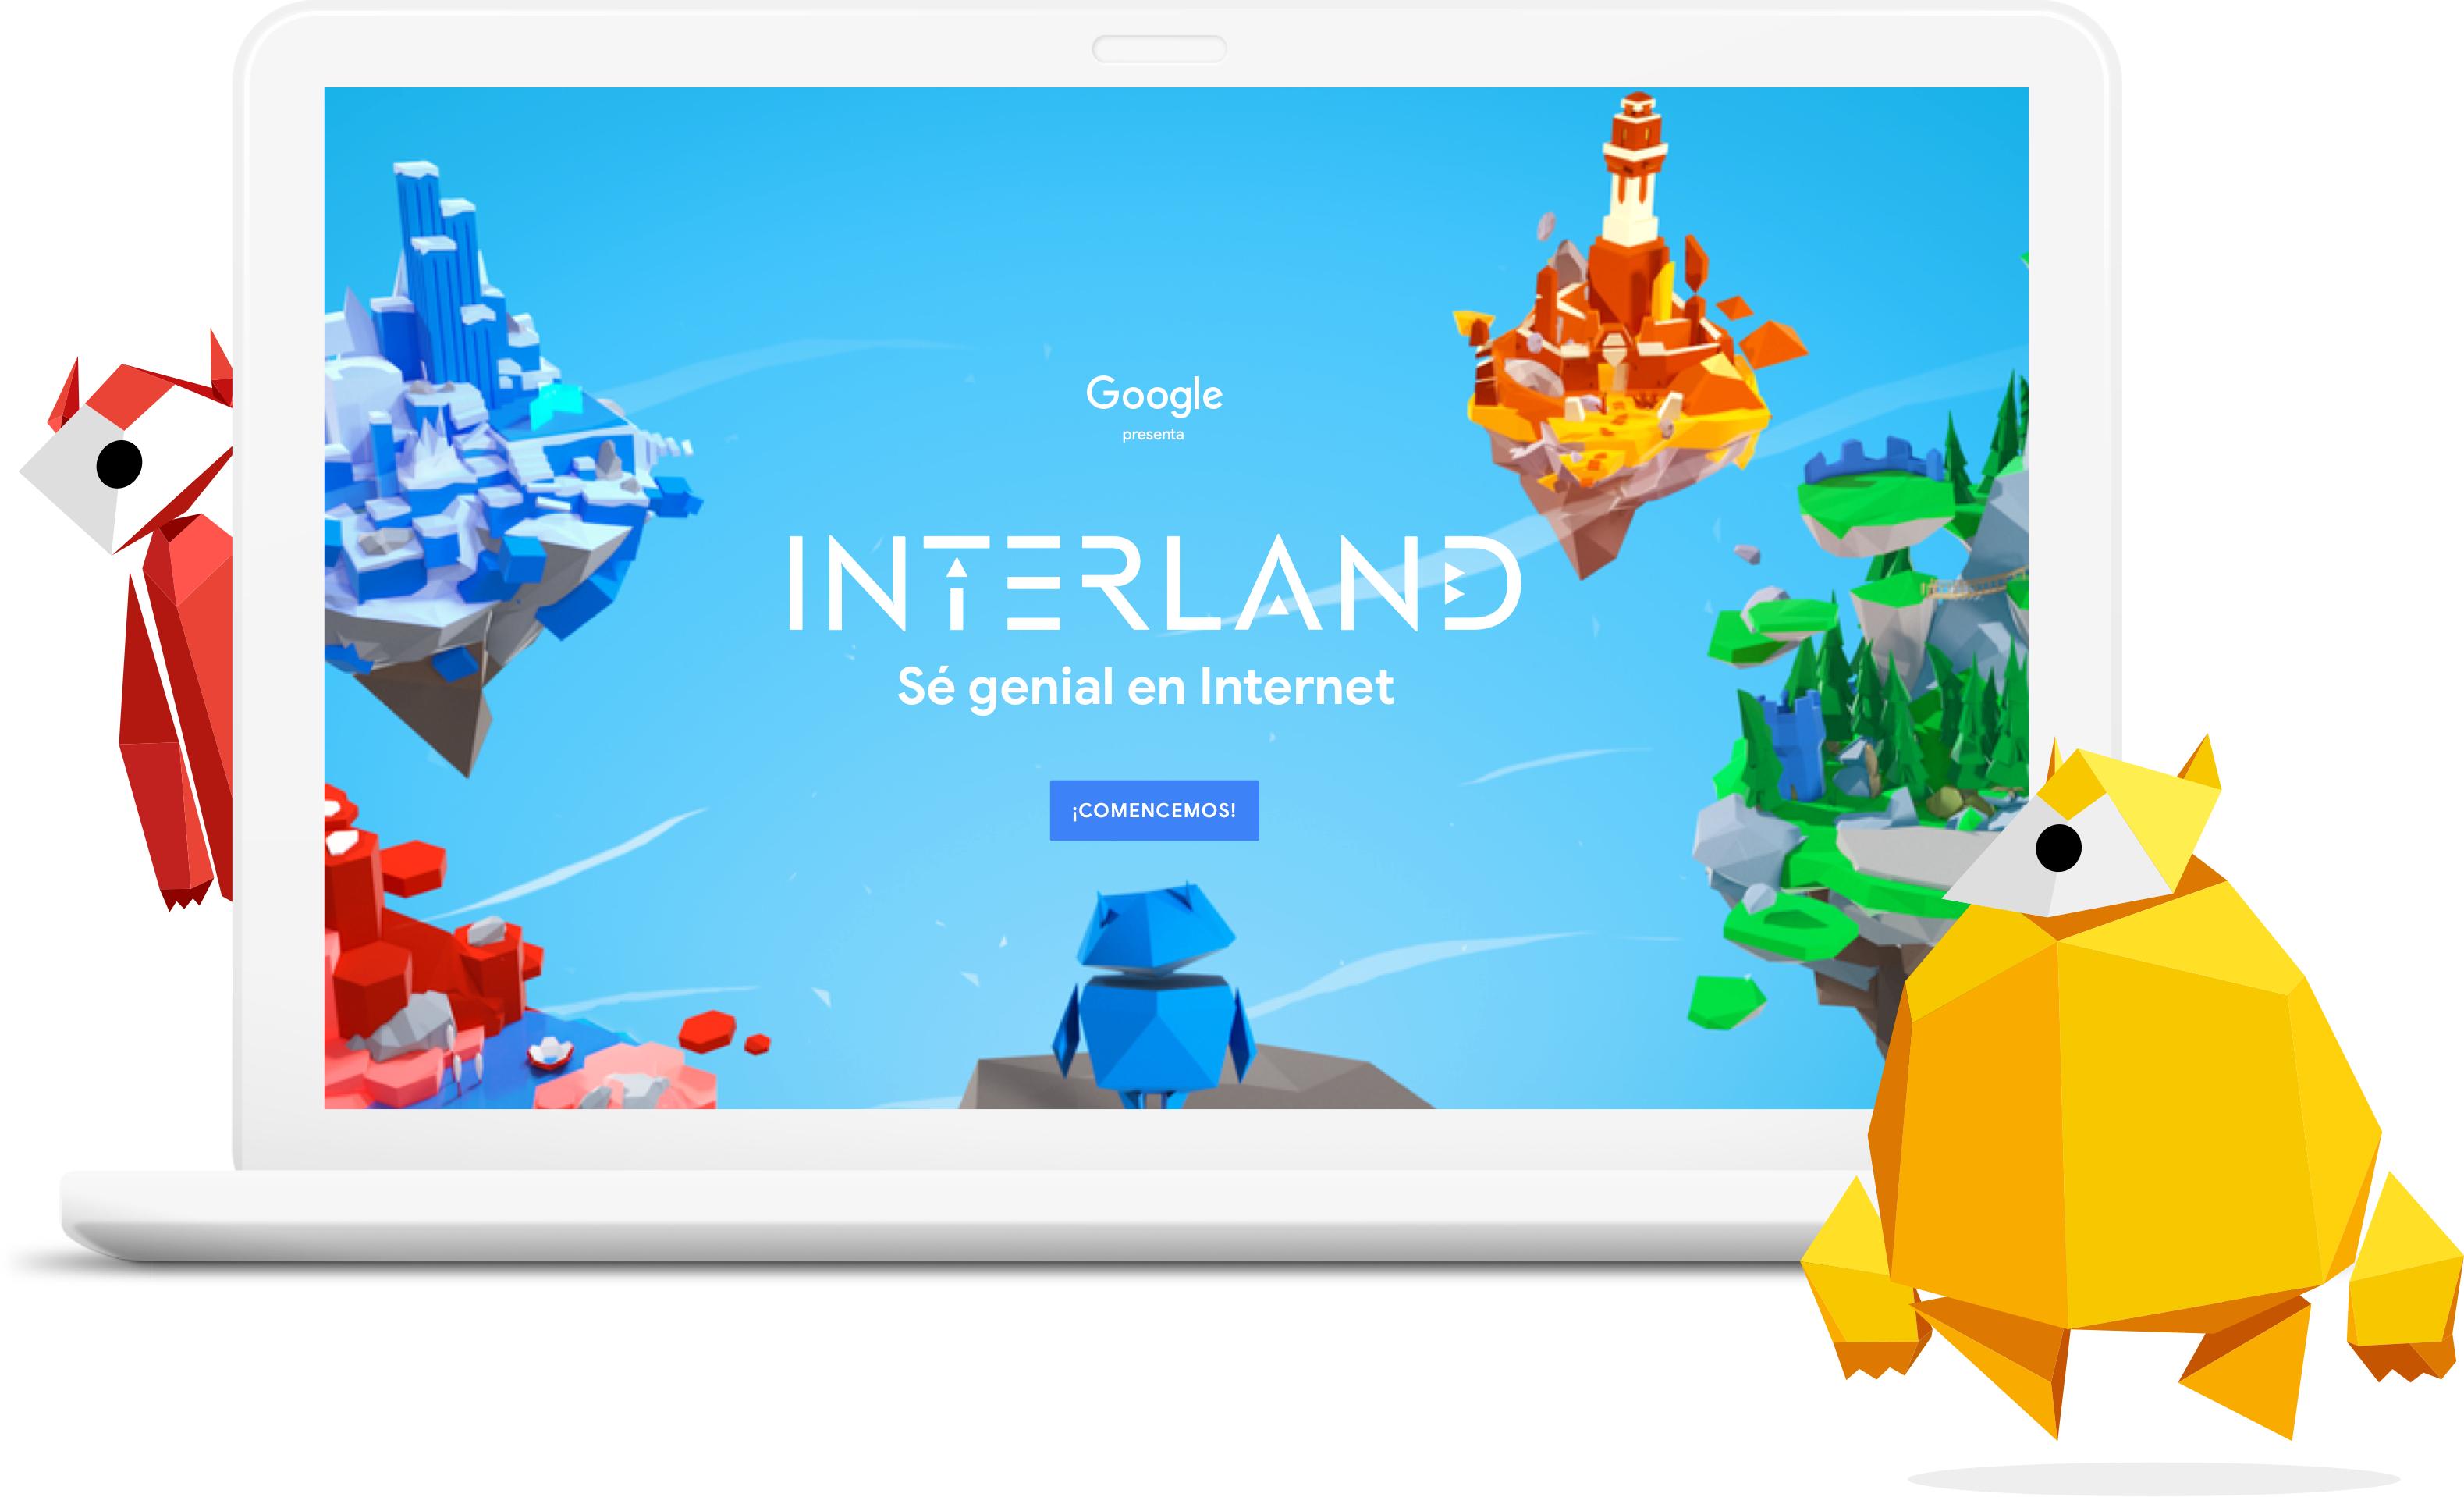 interland google español seguridad internet niños latinos #beinternetawesome #genialeninternet